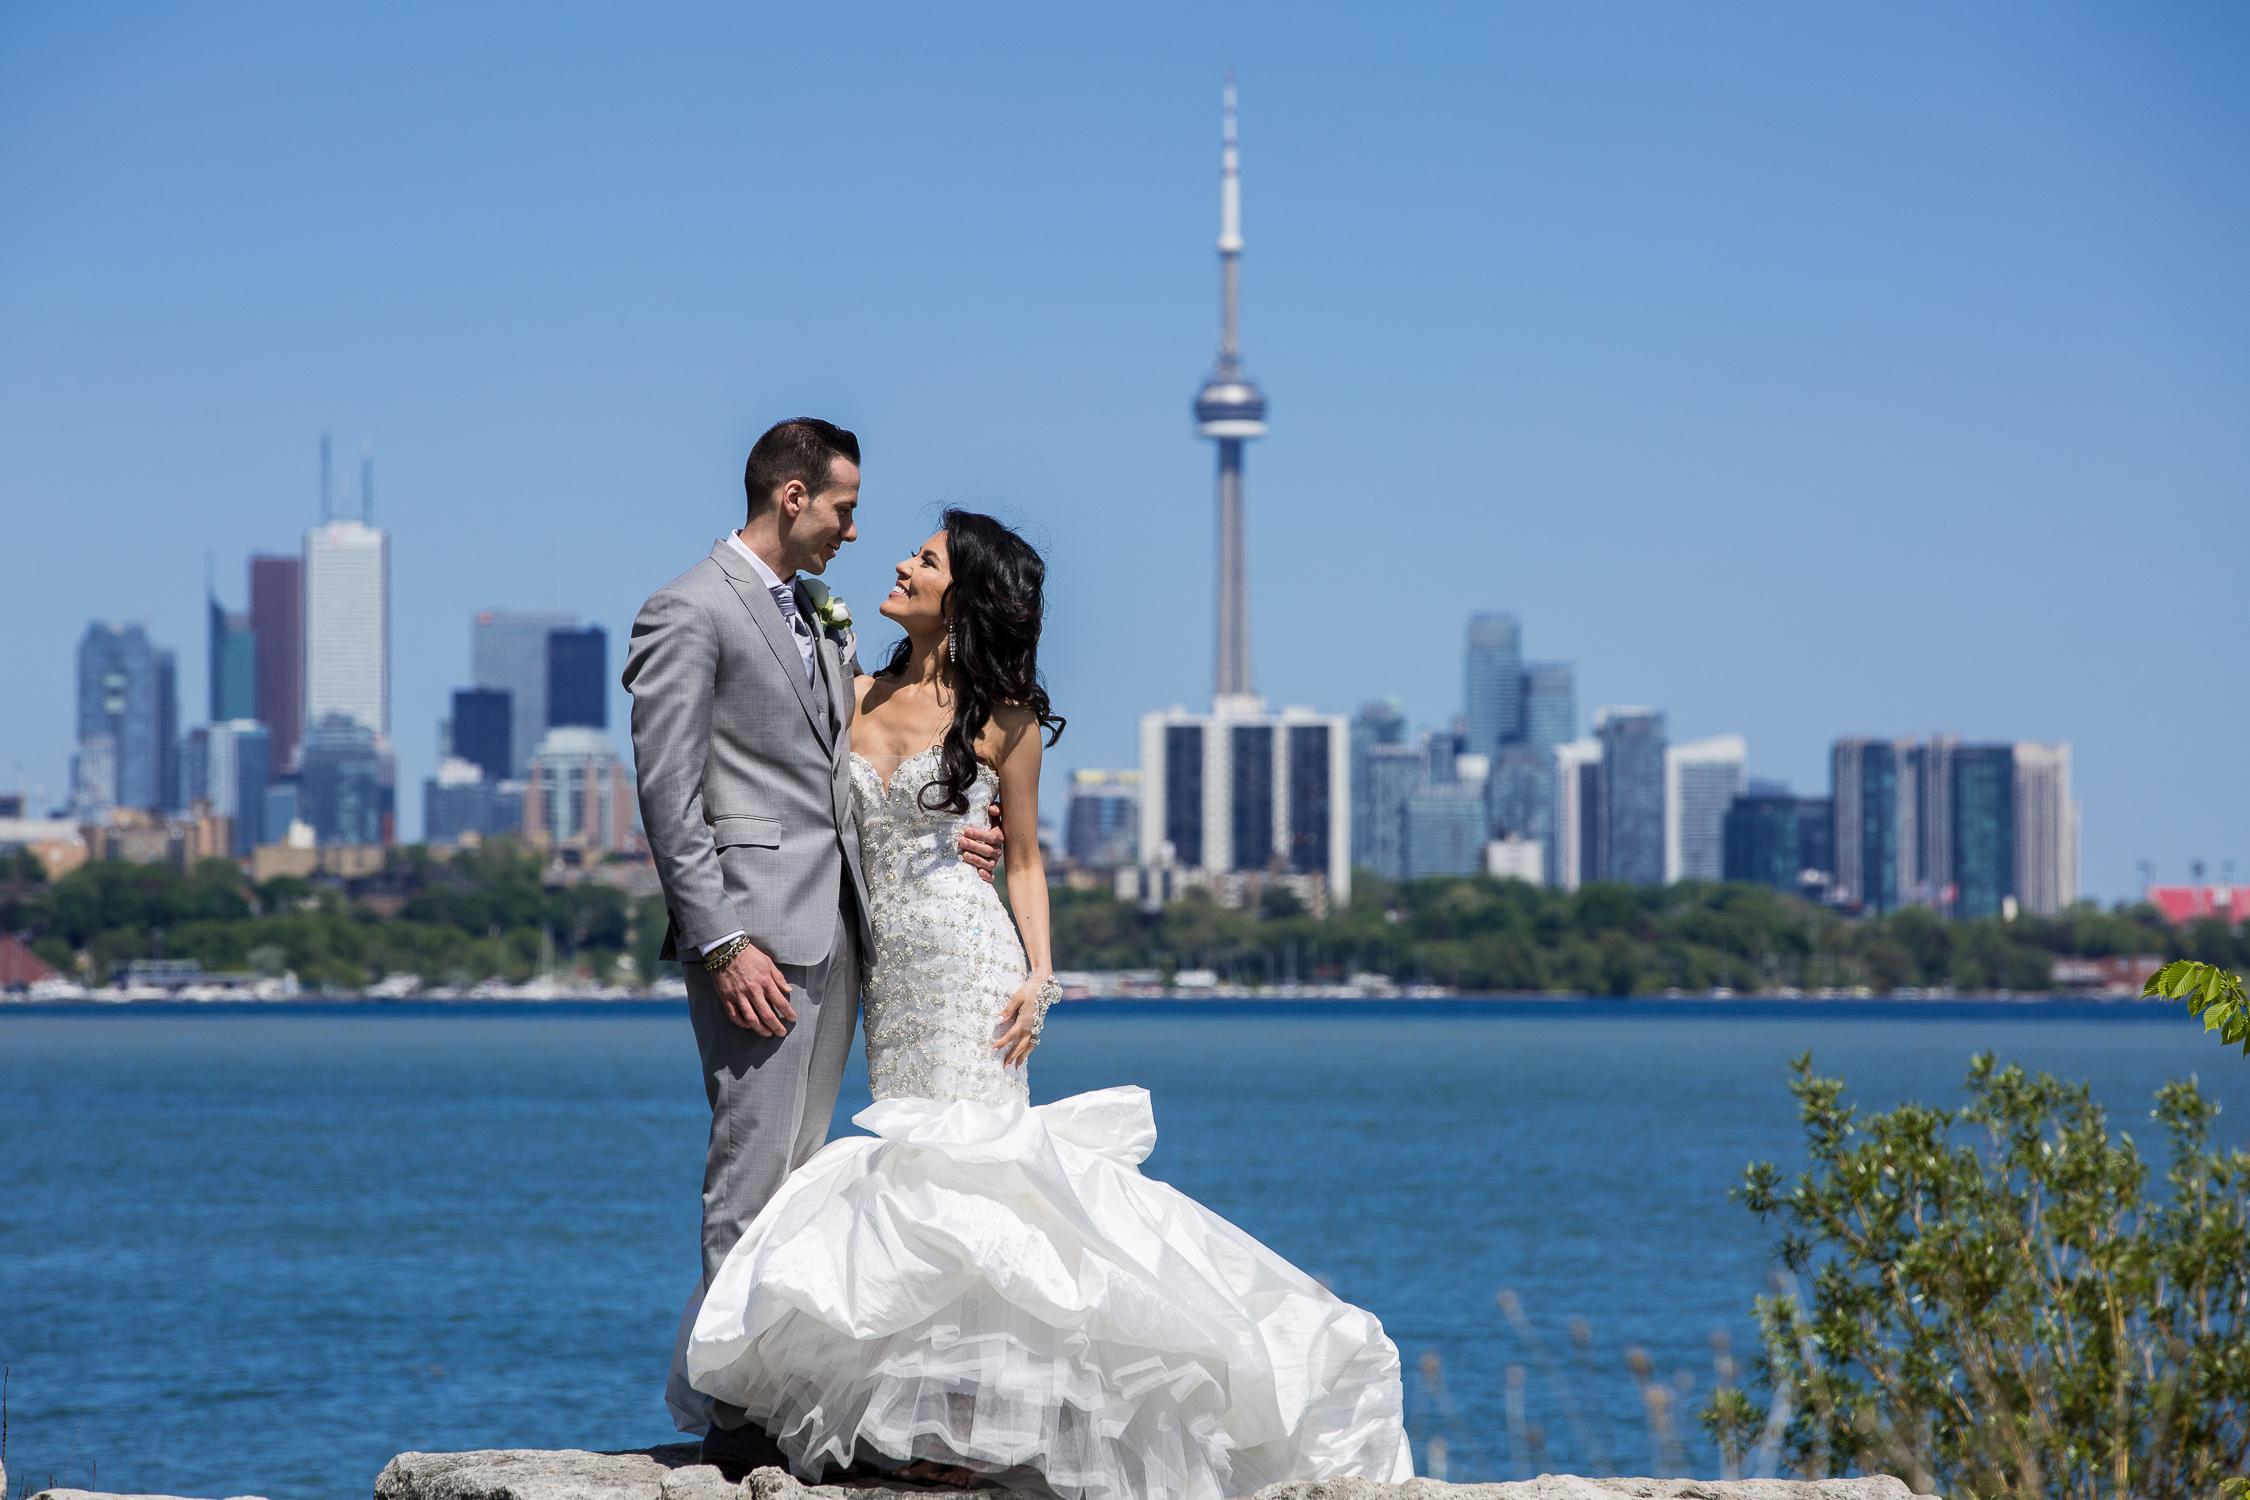 Paradise-Banquet-Hall-Wedding-Vaughan-Ontario-0062.jpg